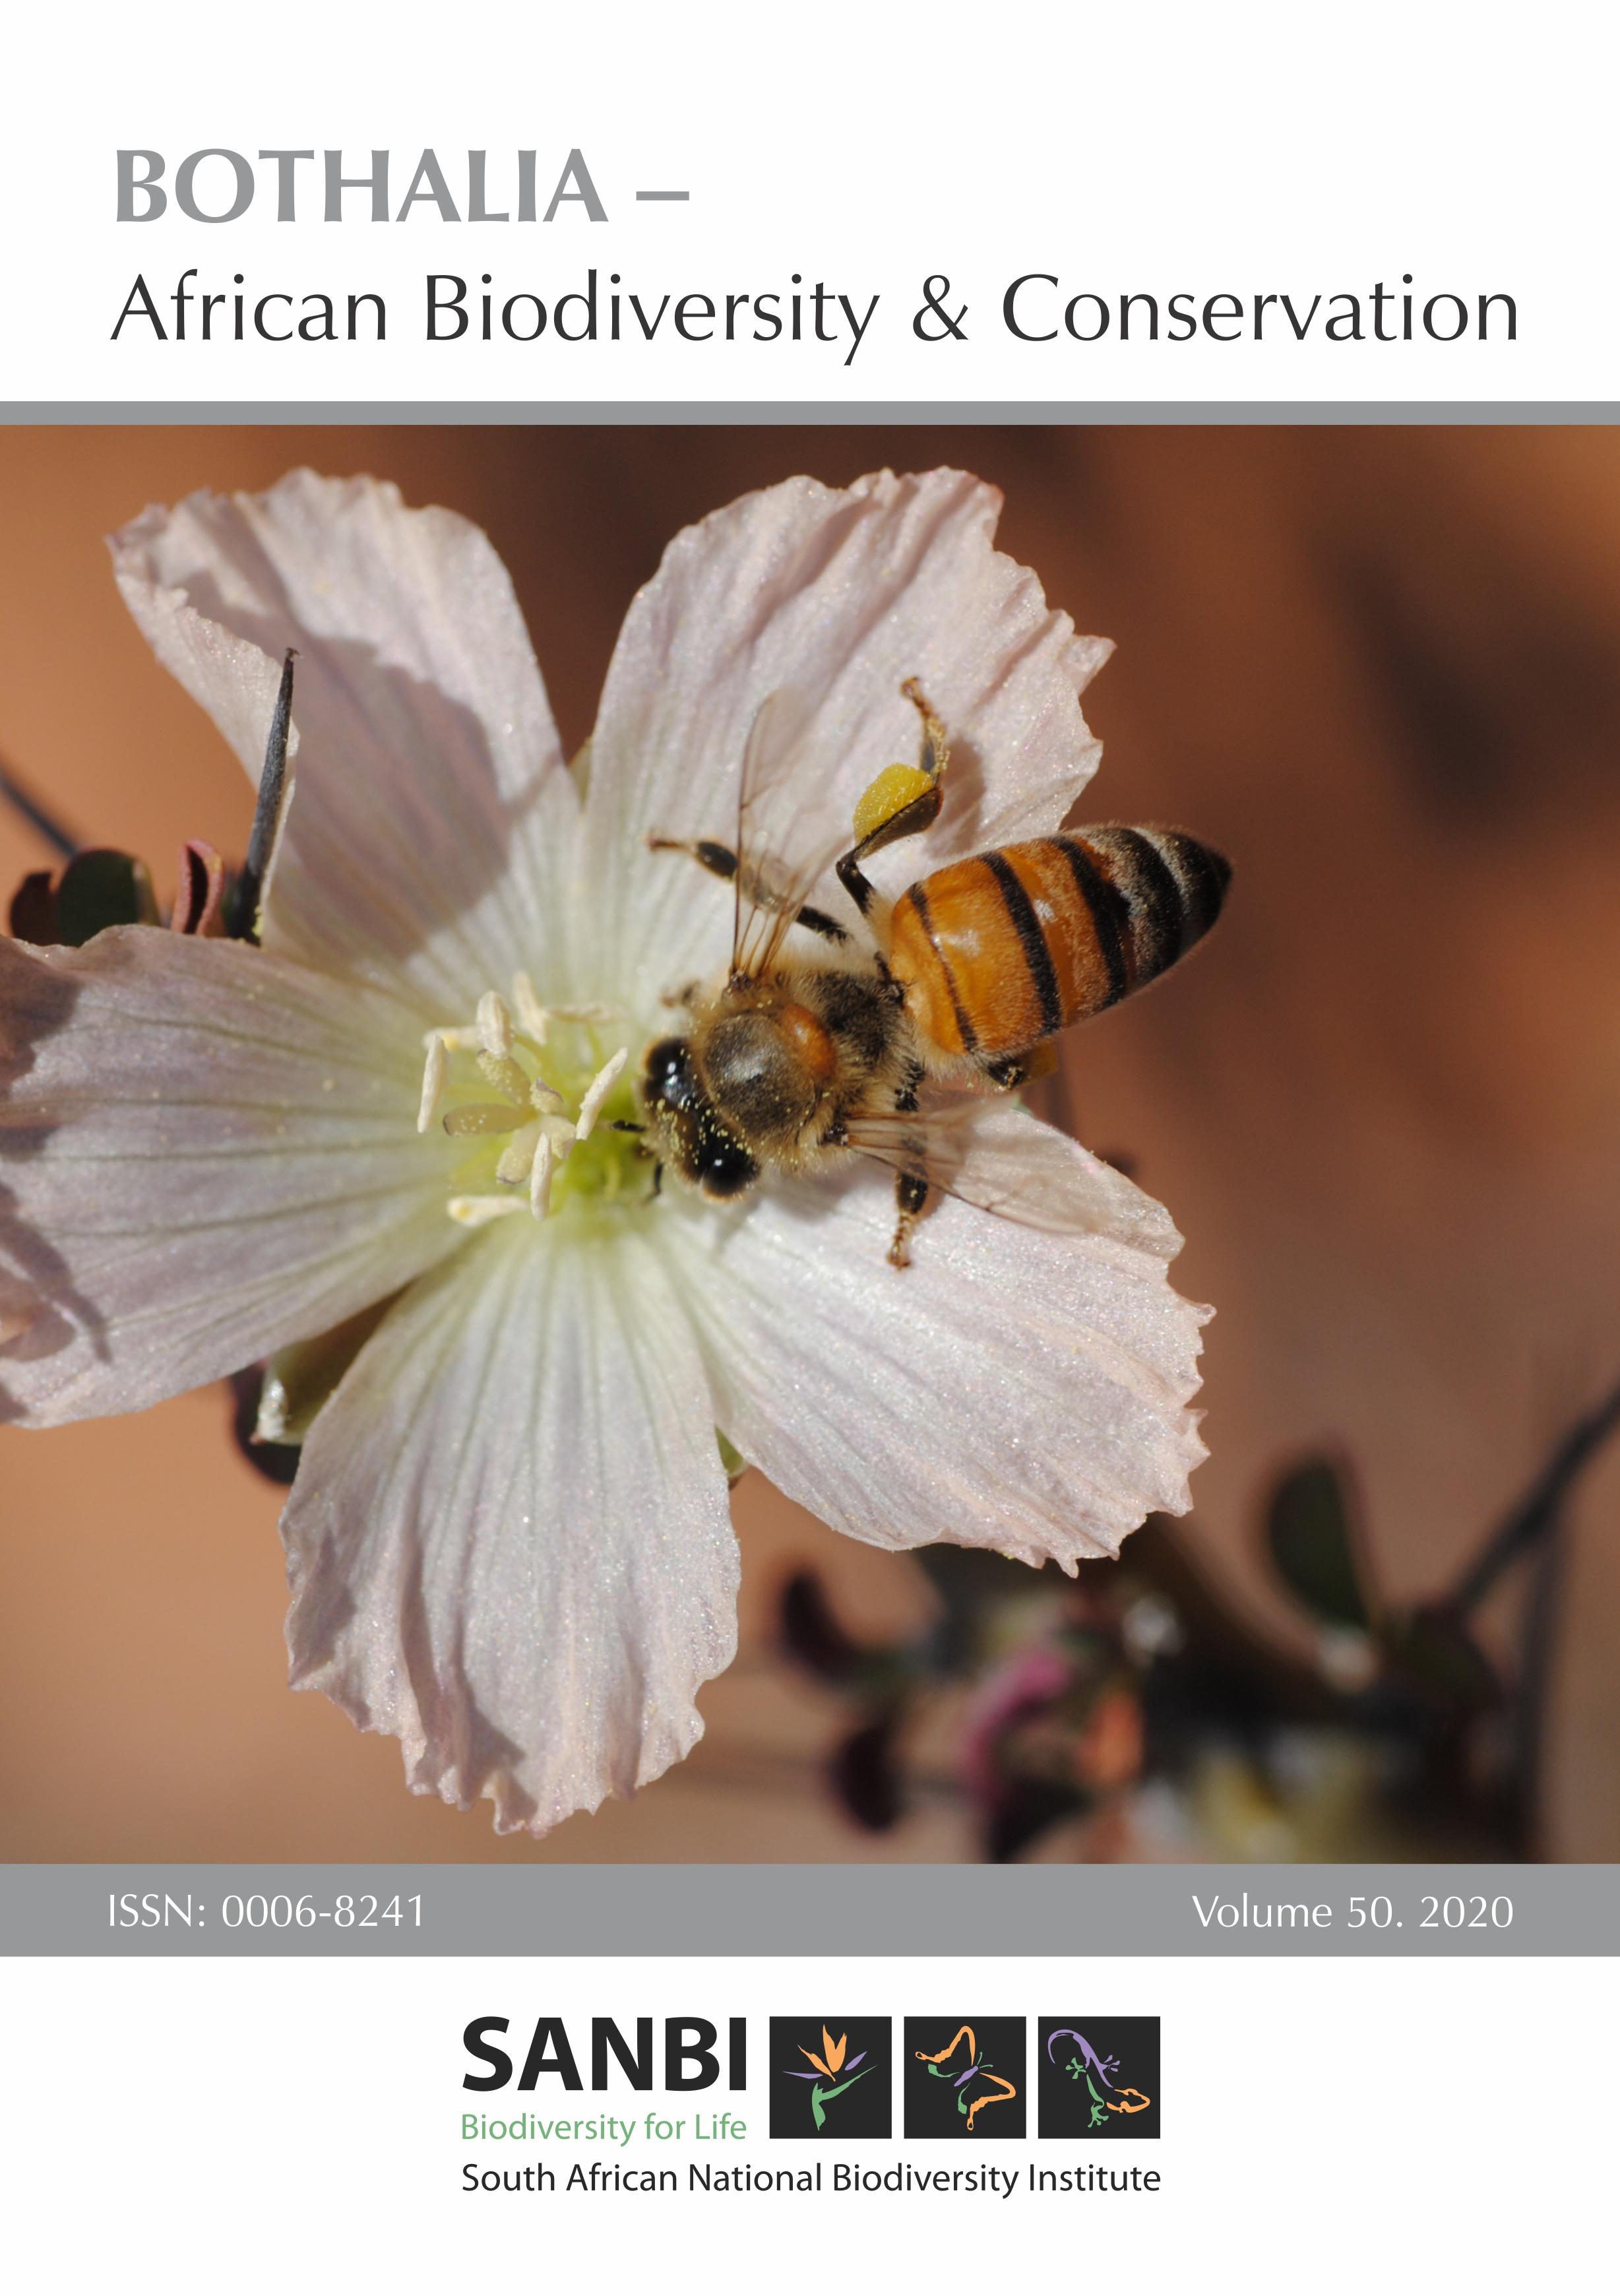 View Vol. 50 No. 1 (2020): Bothalia, African Biodiversity & Conservation